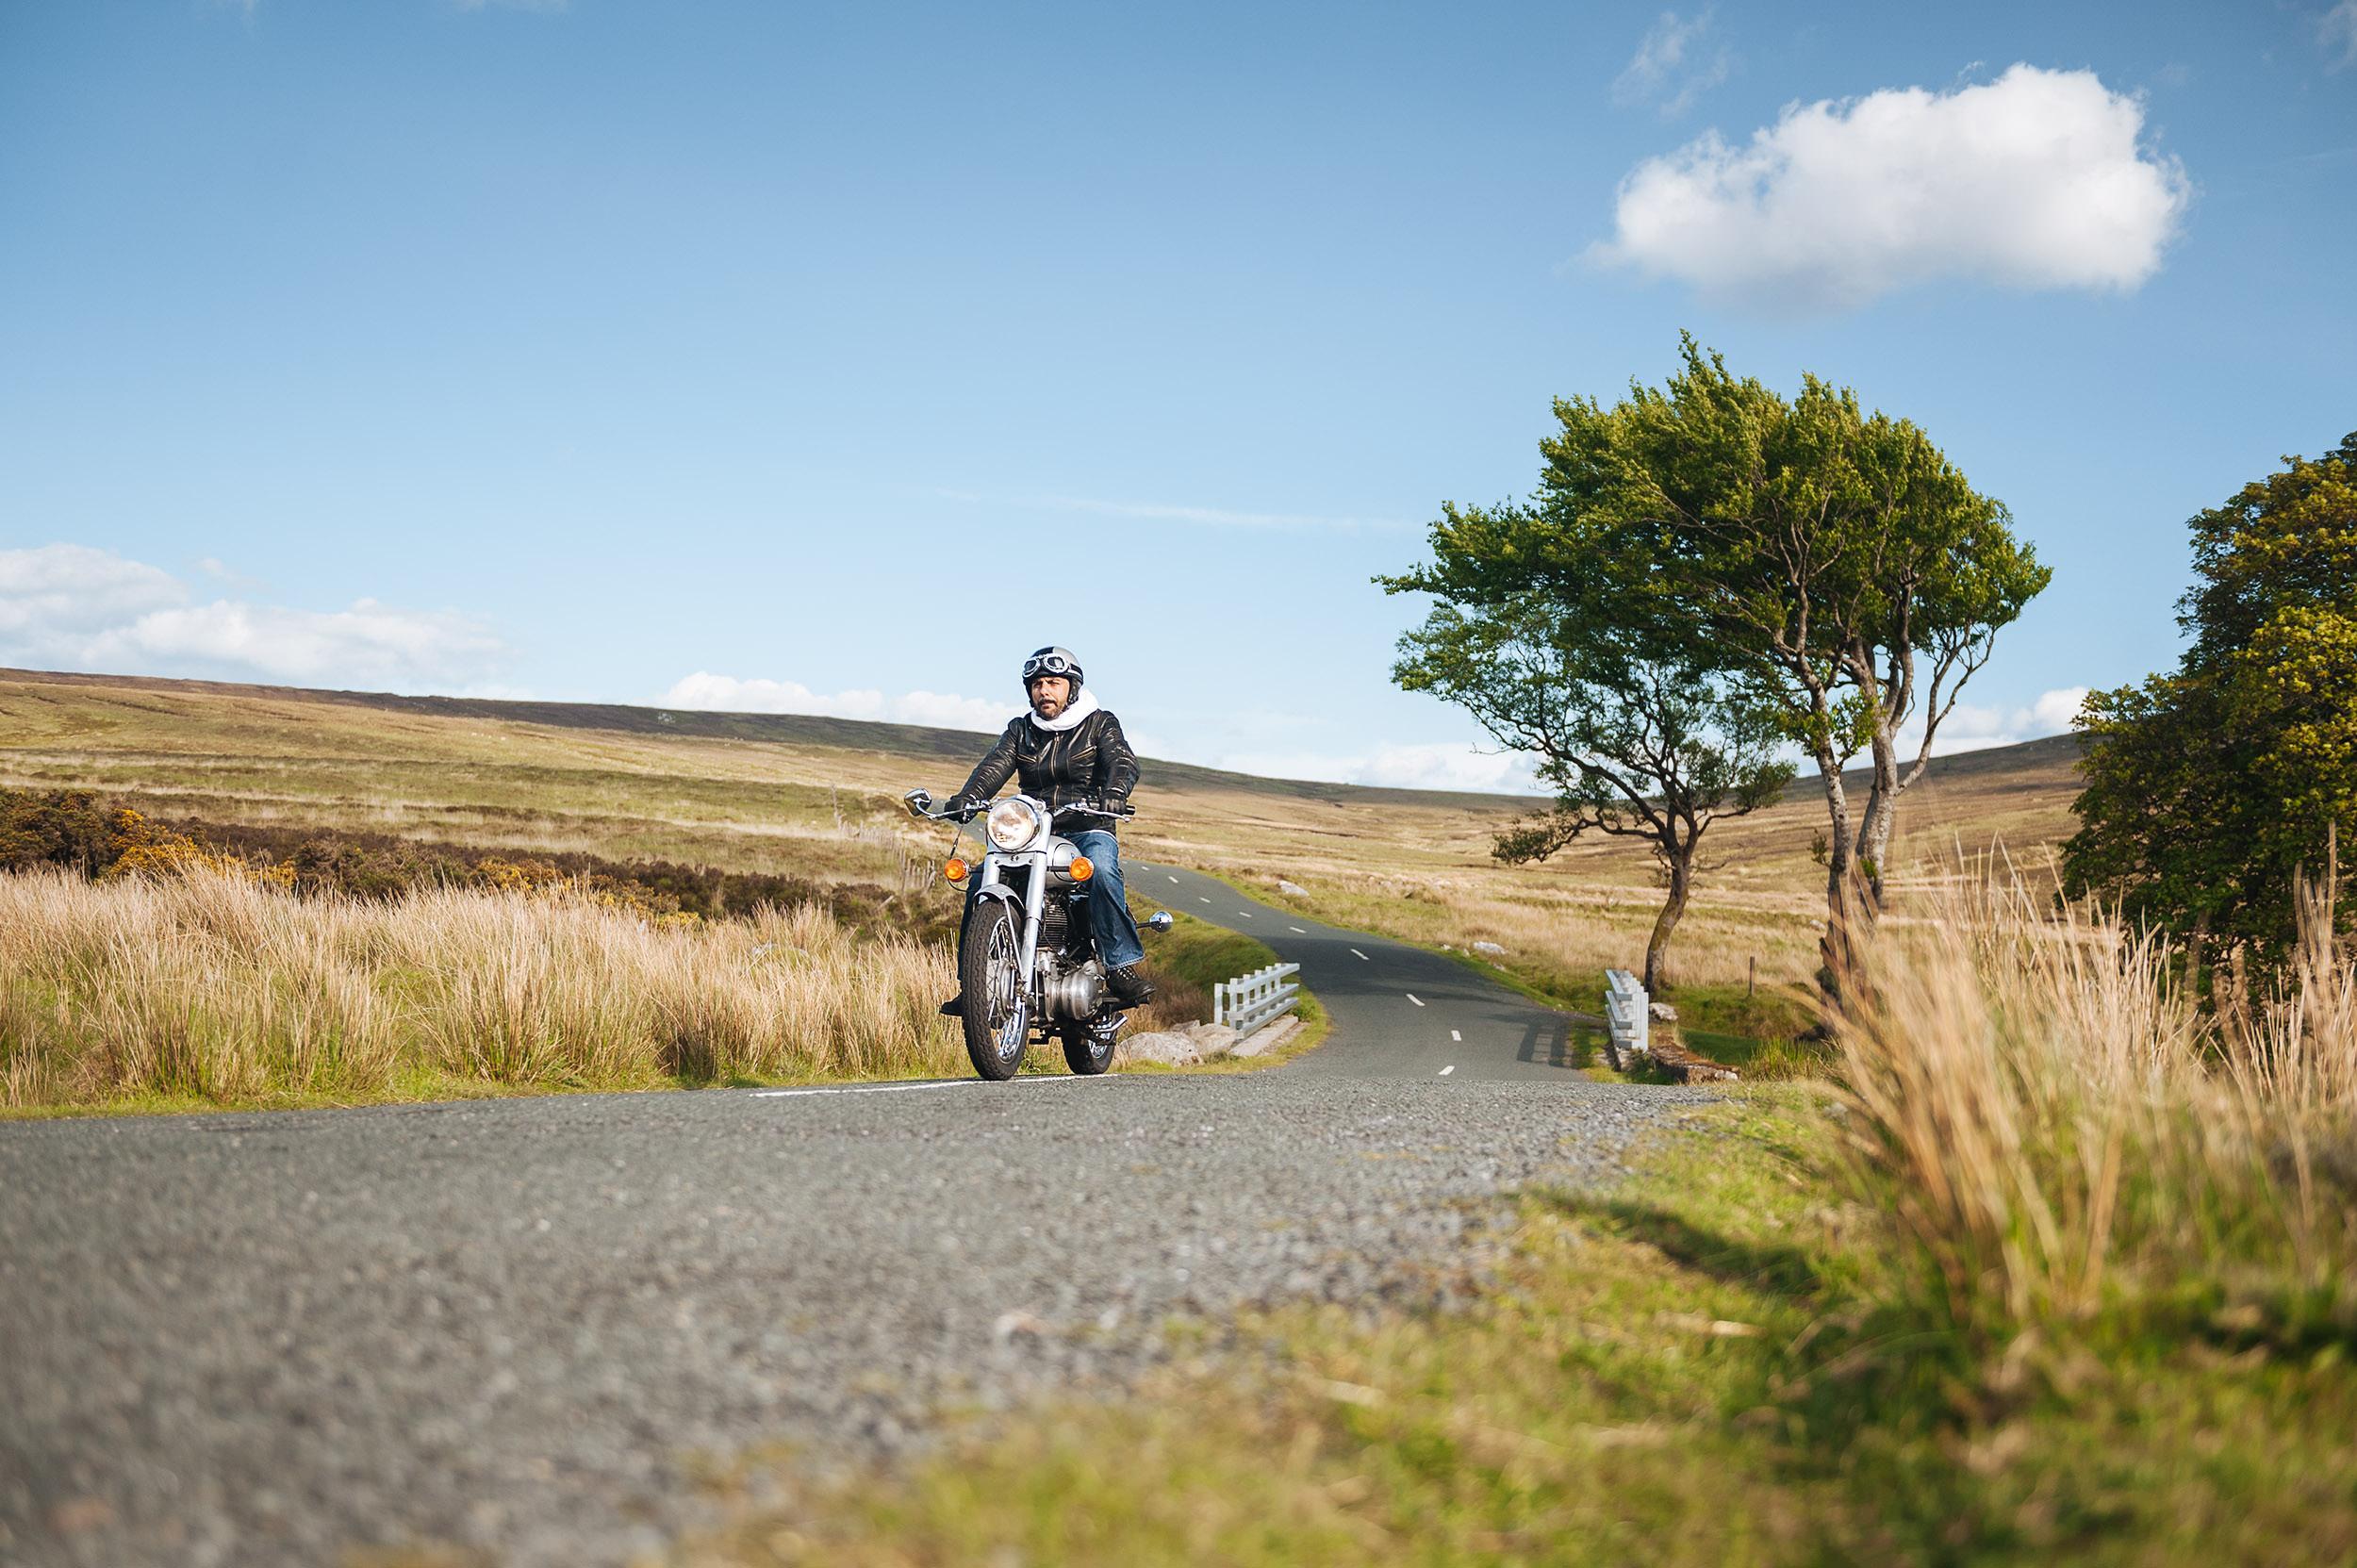 08-outdoor-classic-motorbike-royal-enfield-ireland-wicklow.jpg